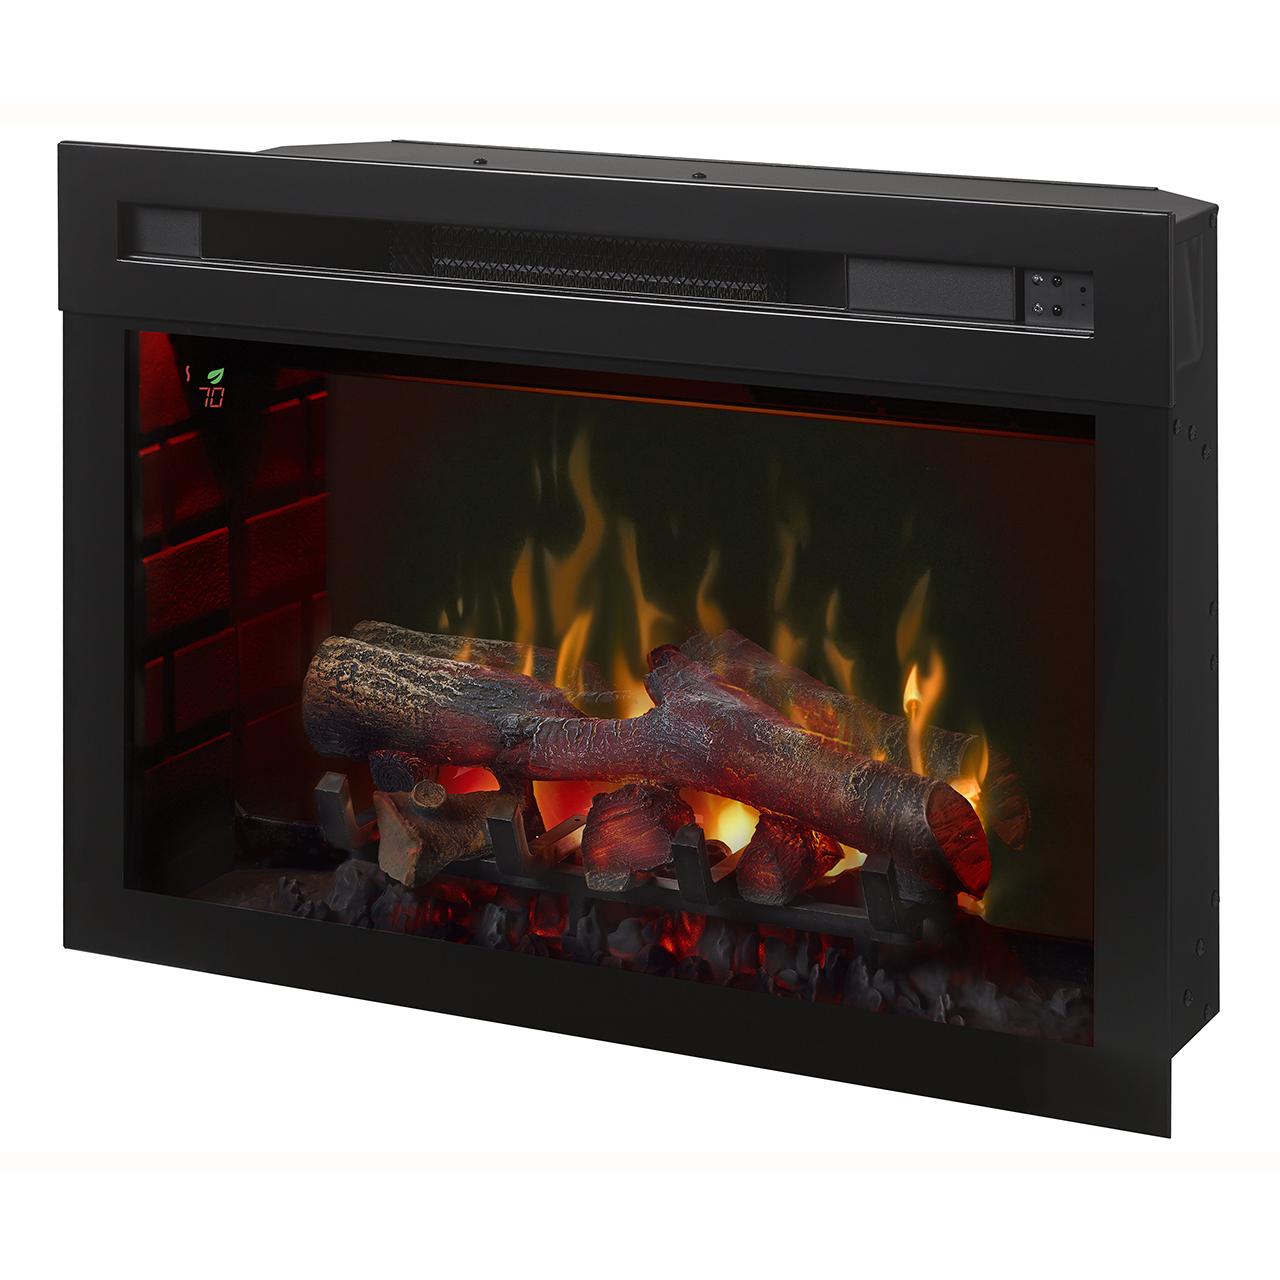 Dimplex 25 Multi Fire Xd Electric Firebox Pf2325hl # Dimplex Foyer Electrique